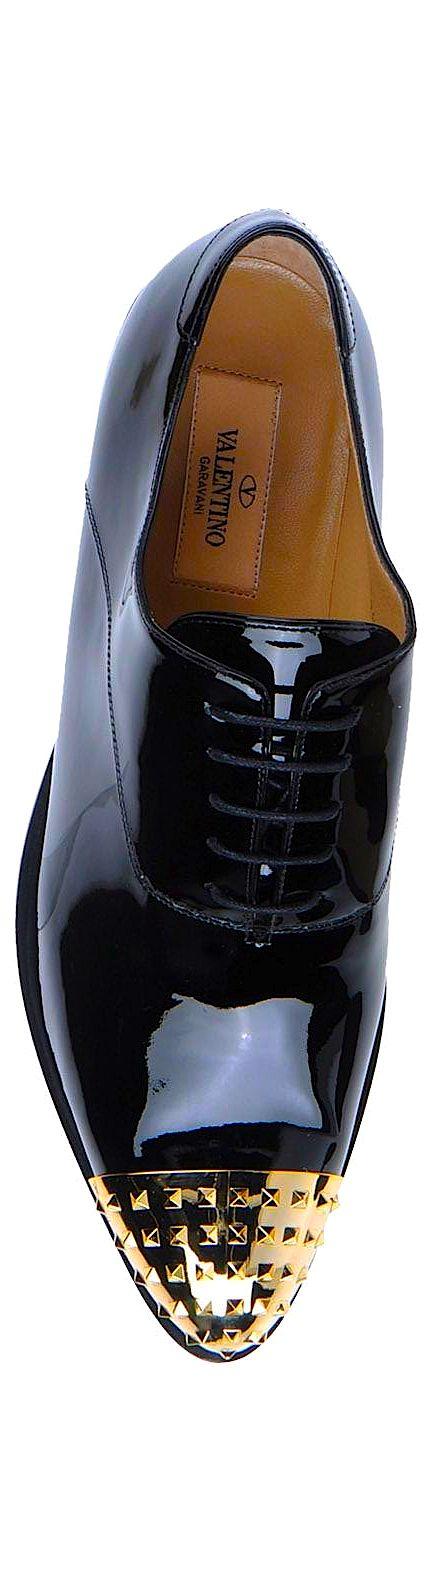 Black & Gold Essence ✦ Valentino ✦ from my board: https://www.pinterest.com/sclarkjordan/black-gold-essence/